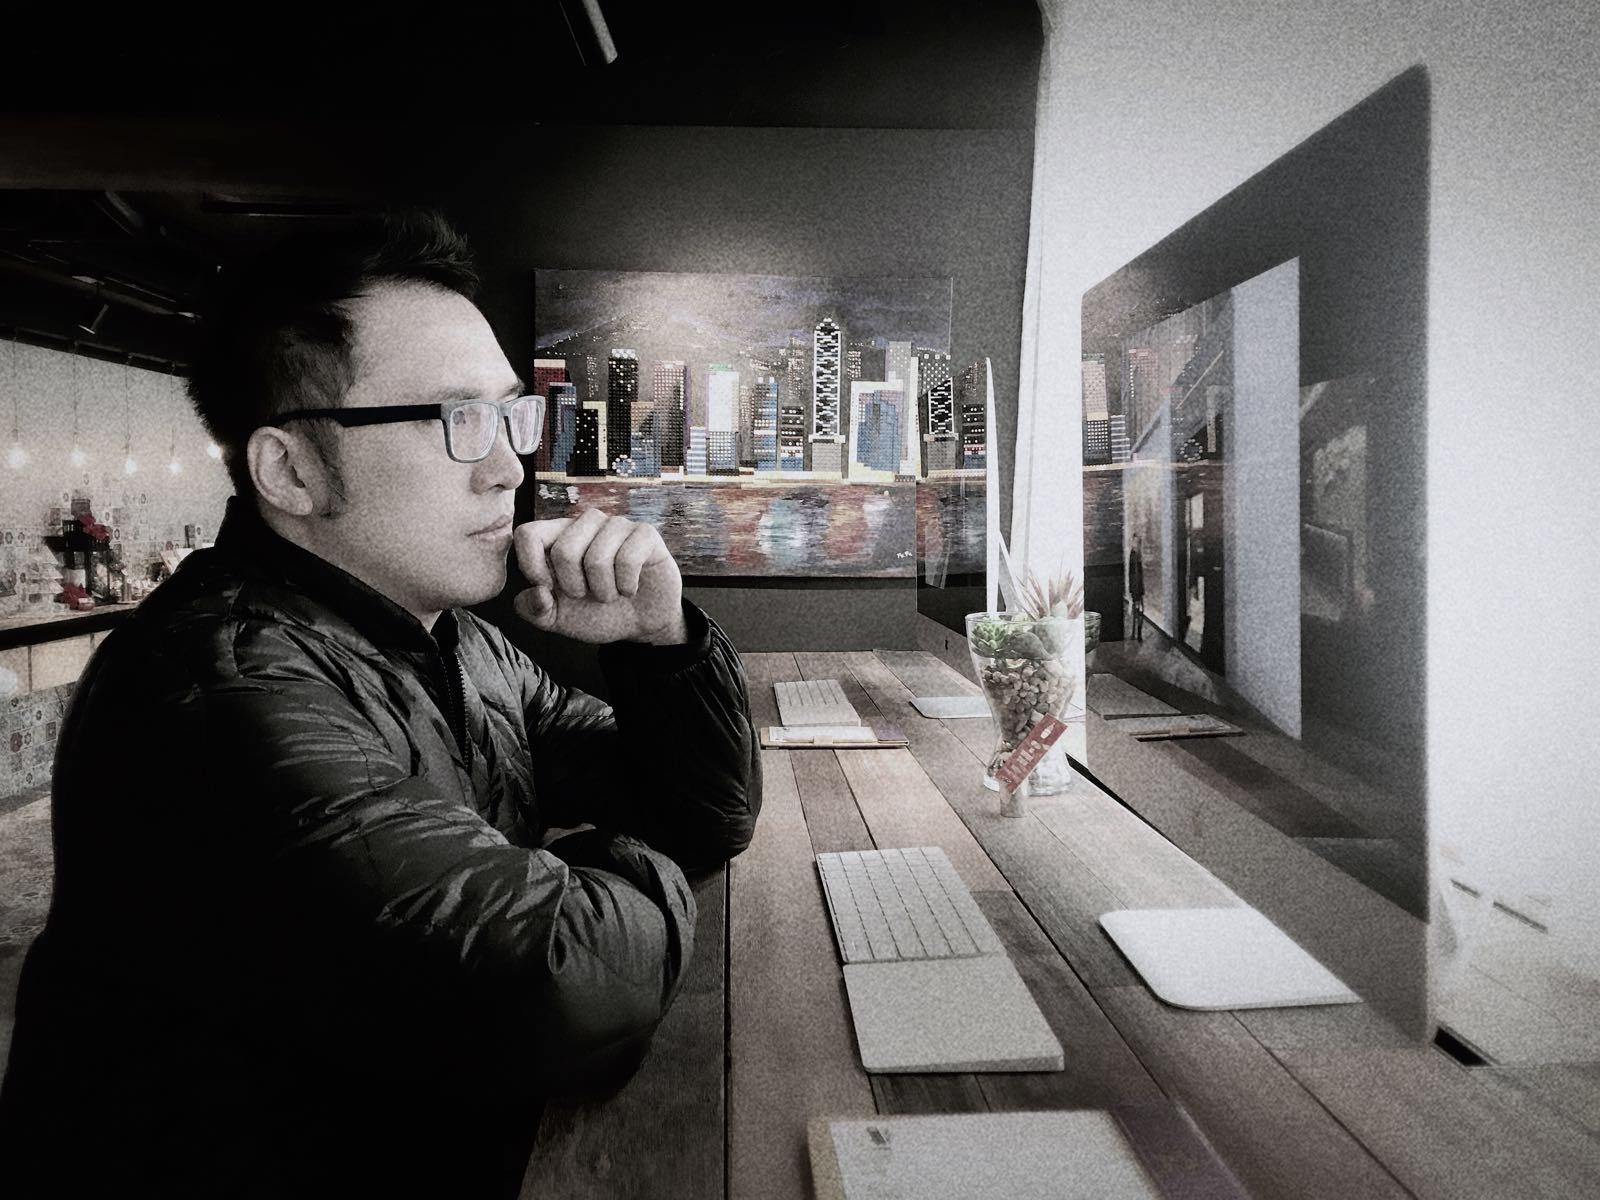 - Harvey LeungCo-Founder, liveinonepage.com1978年生2001年畢業於香港理工大學電子工程系 SARS前曾幻想自己前程似錦 SARS後隨香港一起每況愈下2005年認識生命中最重要的人2007年隨太太定居澳門2017年成立liveinonepage.com